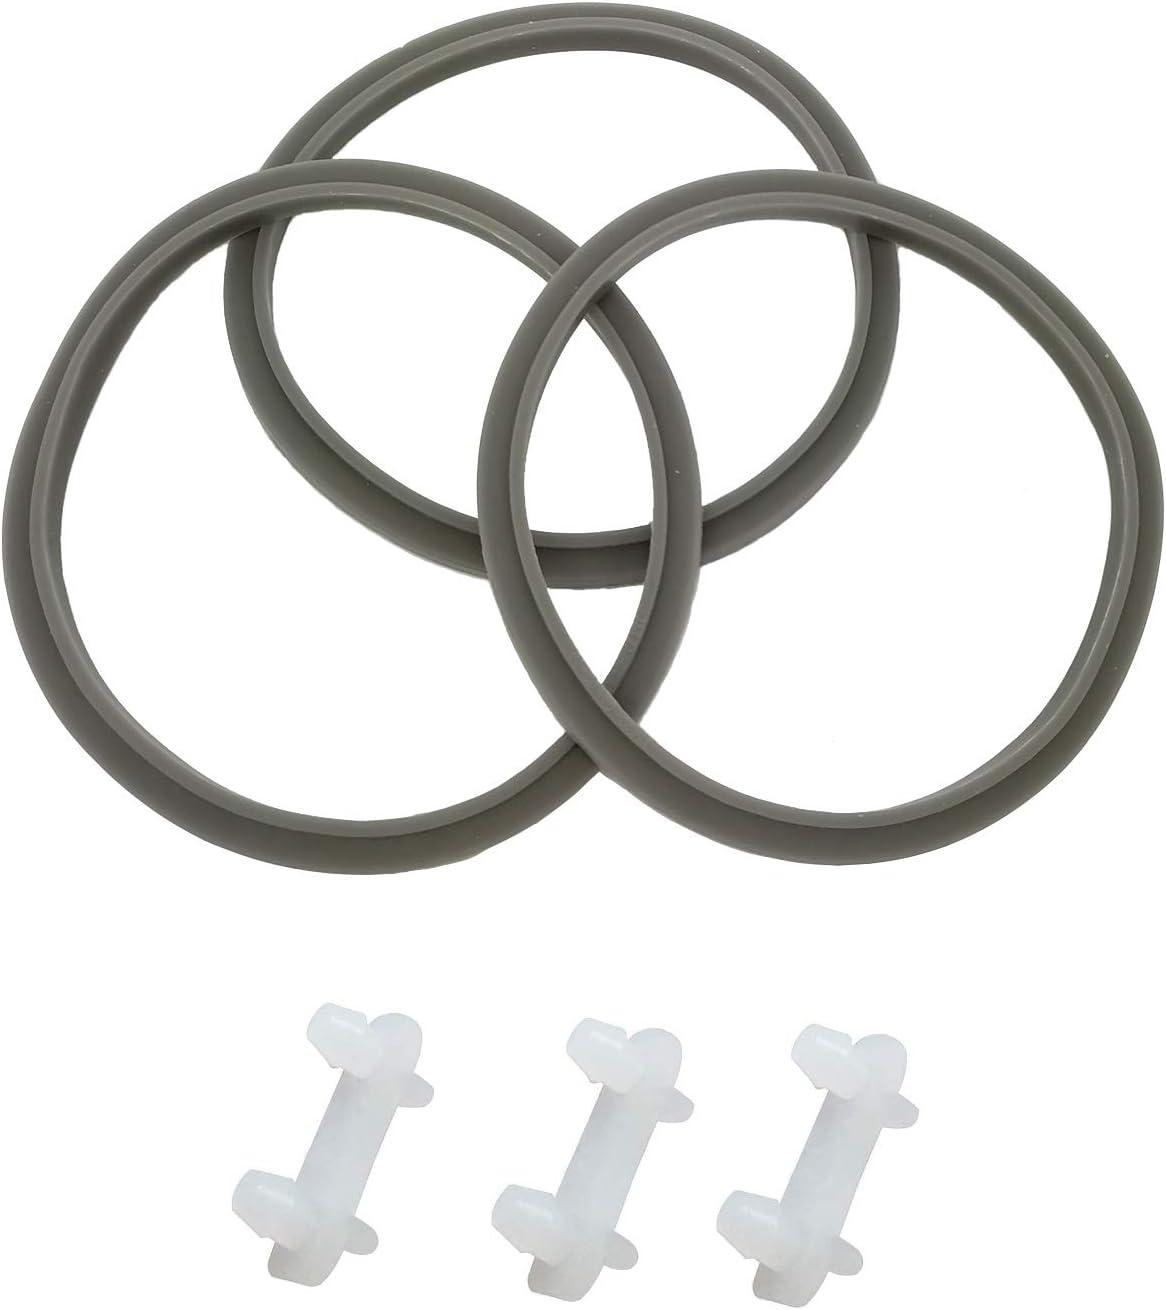 WAFJAMF 3PCS Seal Ring Gaskets with Lip, Replacement Gasket, for Nutribullet,3PCS Rubber Bushing Shock Pad for Nutribullet 600W 900W Blender NB-101B NB-101S NB-201